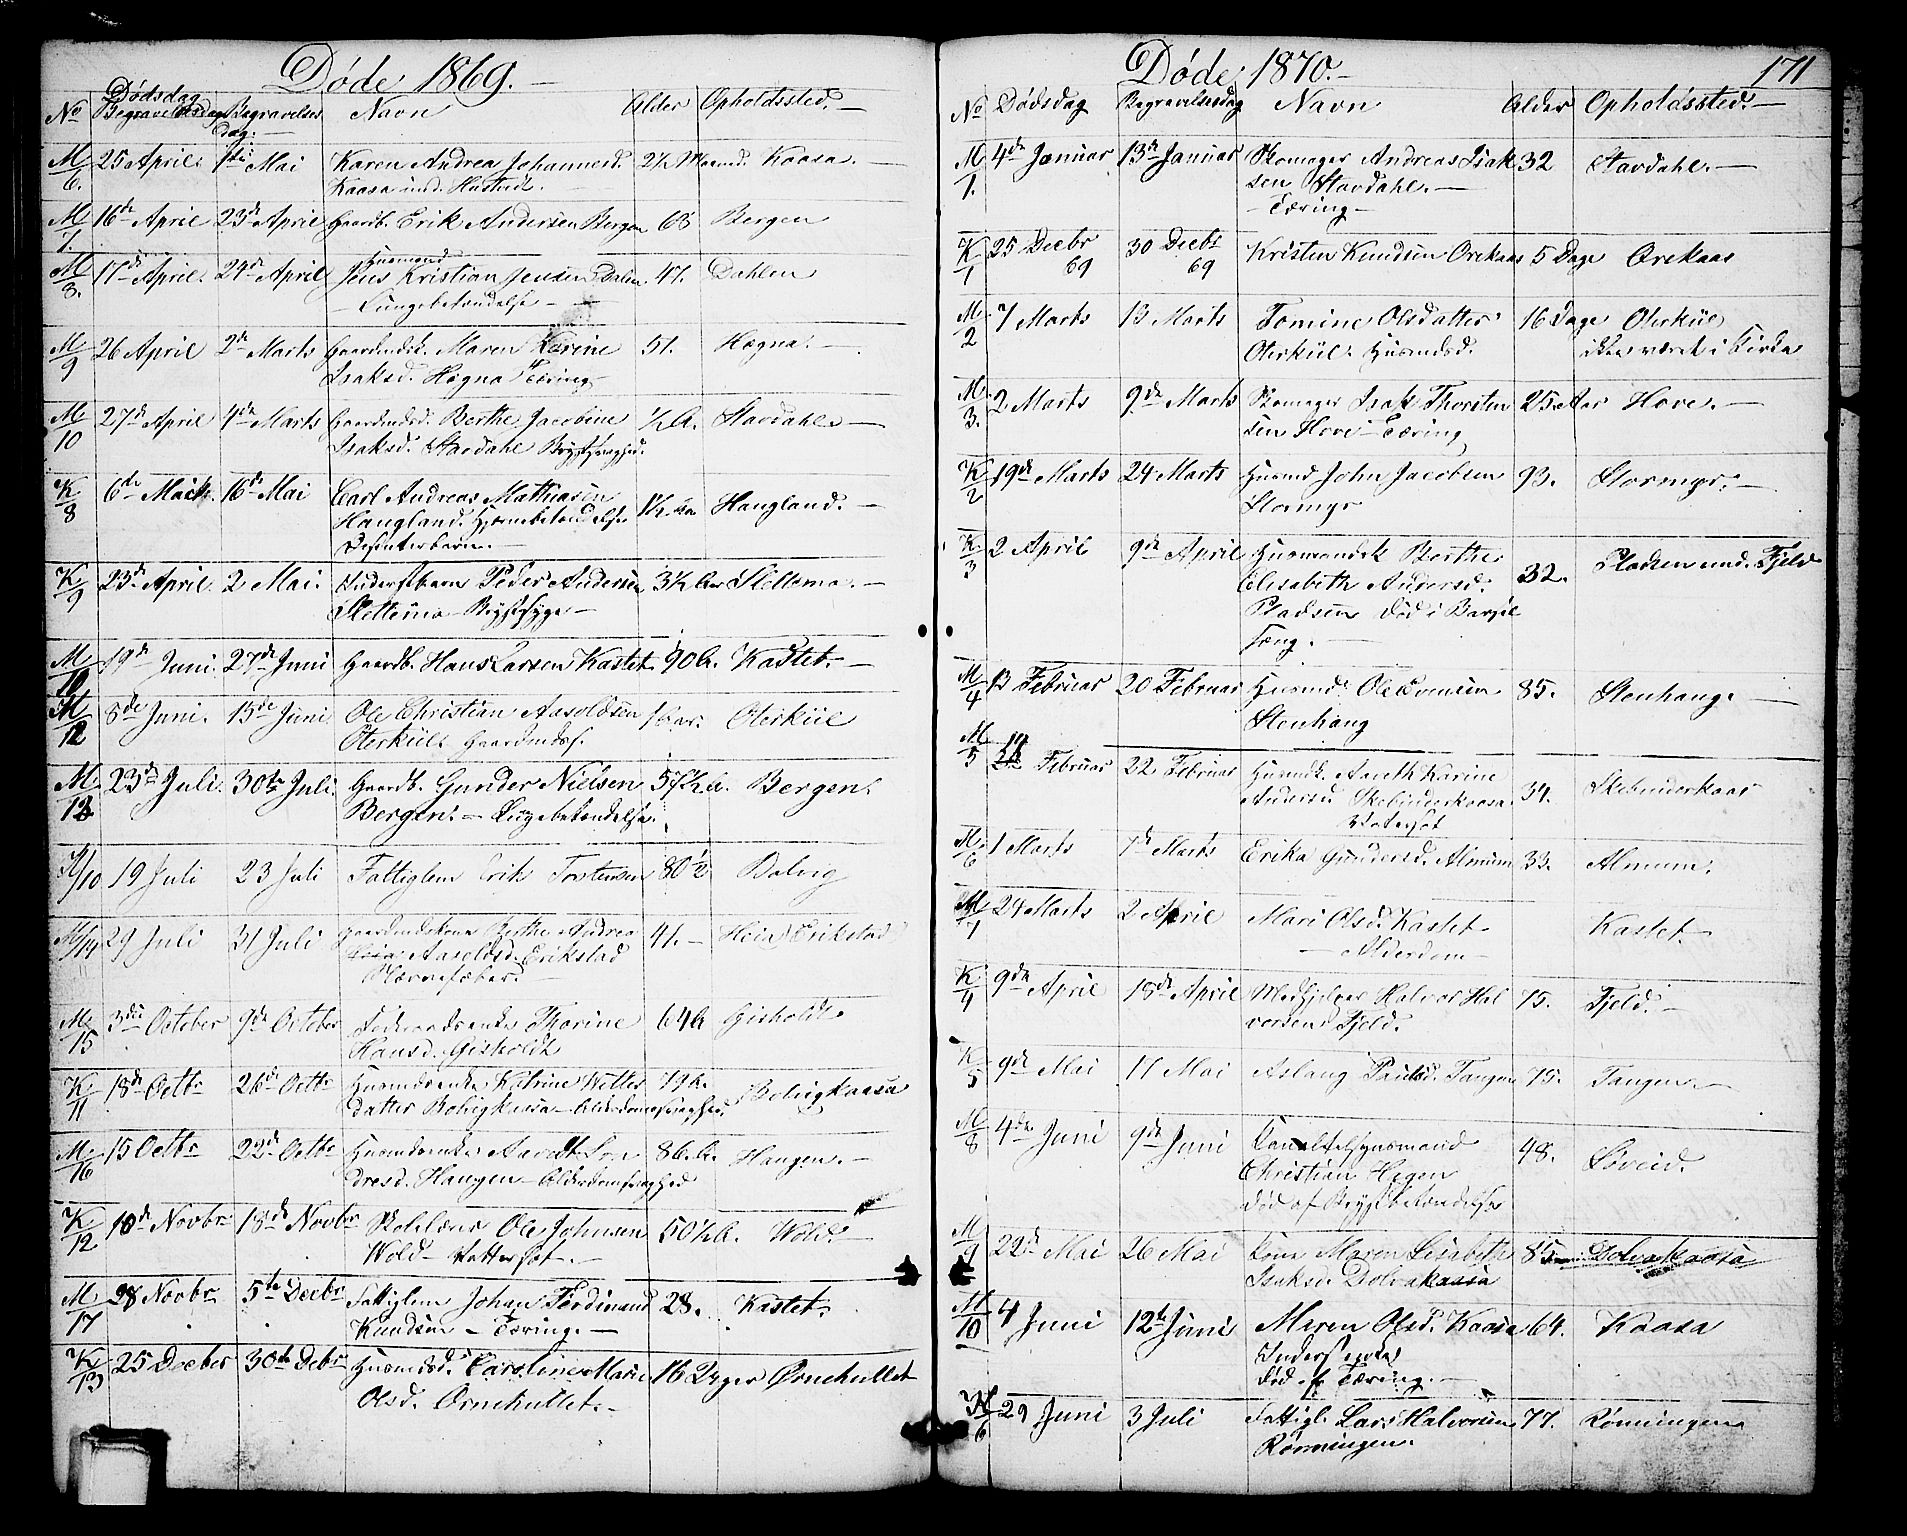 SAKO, Solum kirkebøker, G/Gb/L0002: Klokkerbok nr. II 2, 1859-1879, s. 171